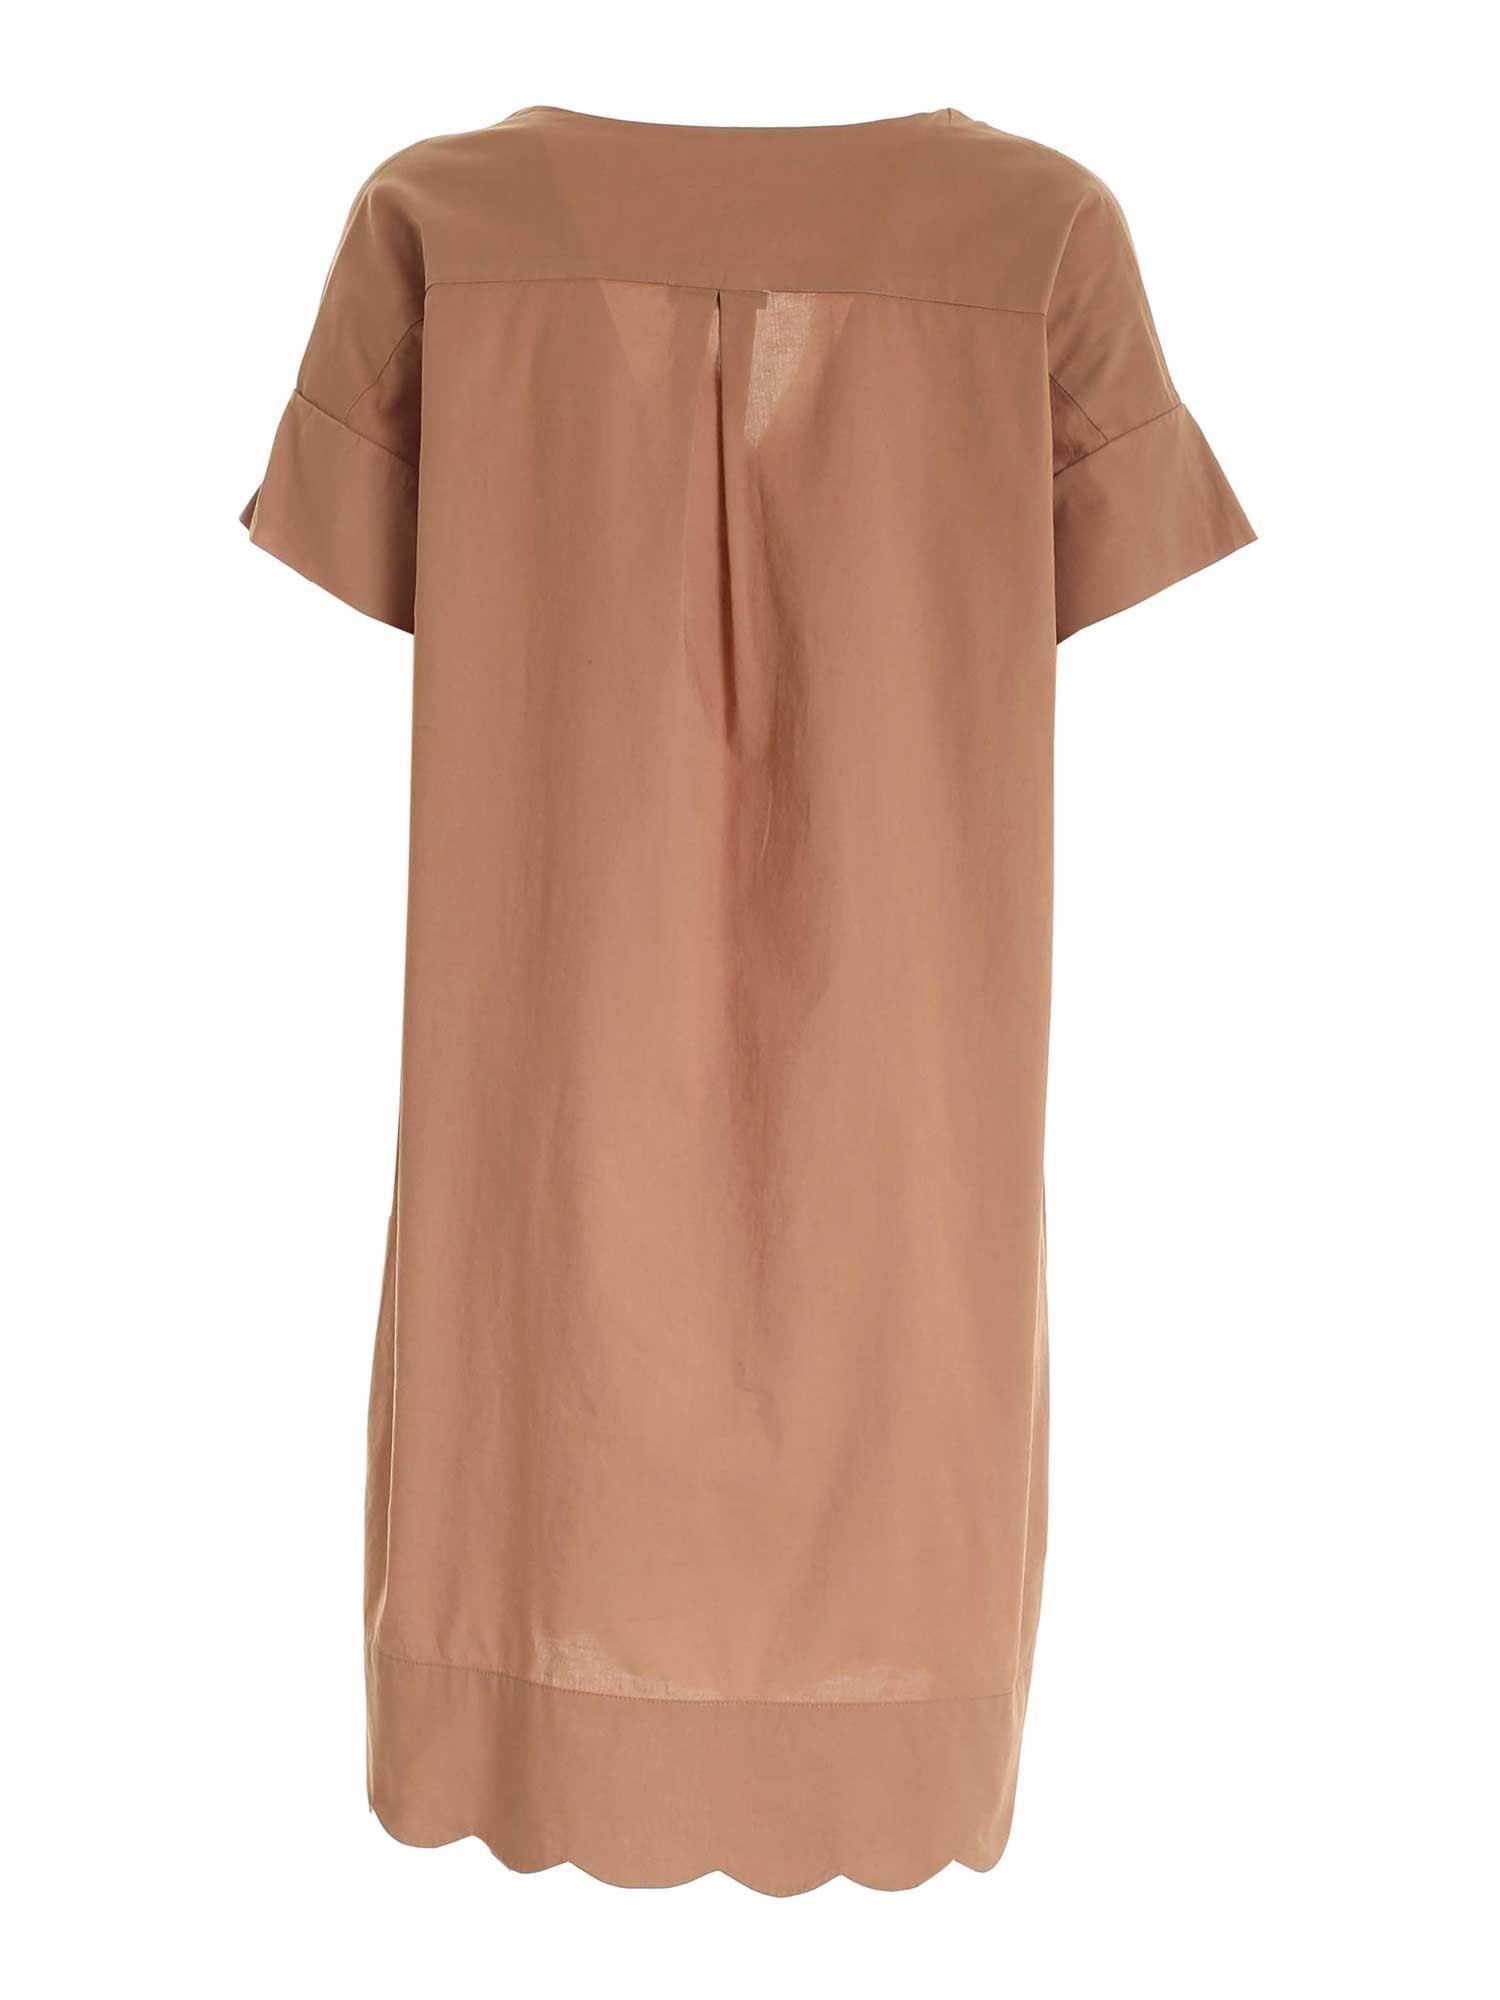 SHORT SLEEVES DRESS IN BROWN PAOLO FIORILLO CAPRI | 11 | 29401200118